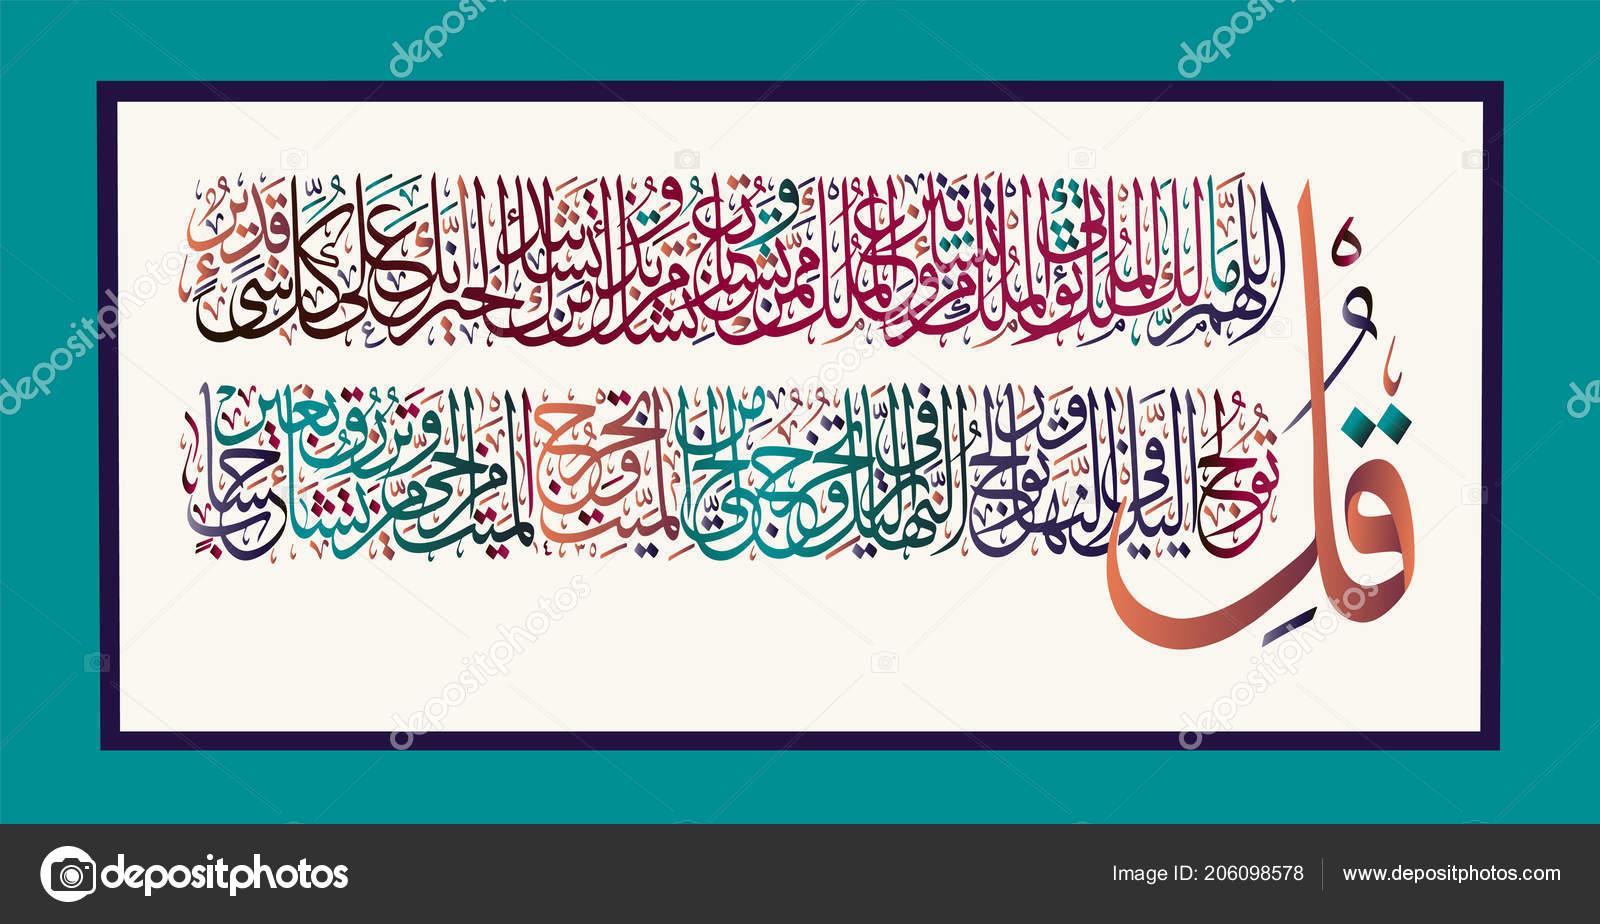 Wallpapers Quran Verses Wallpaper Islamic Calligraphy